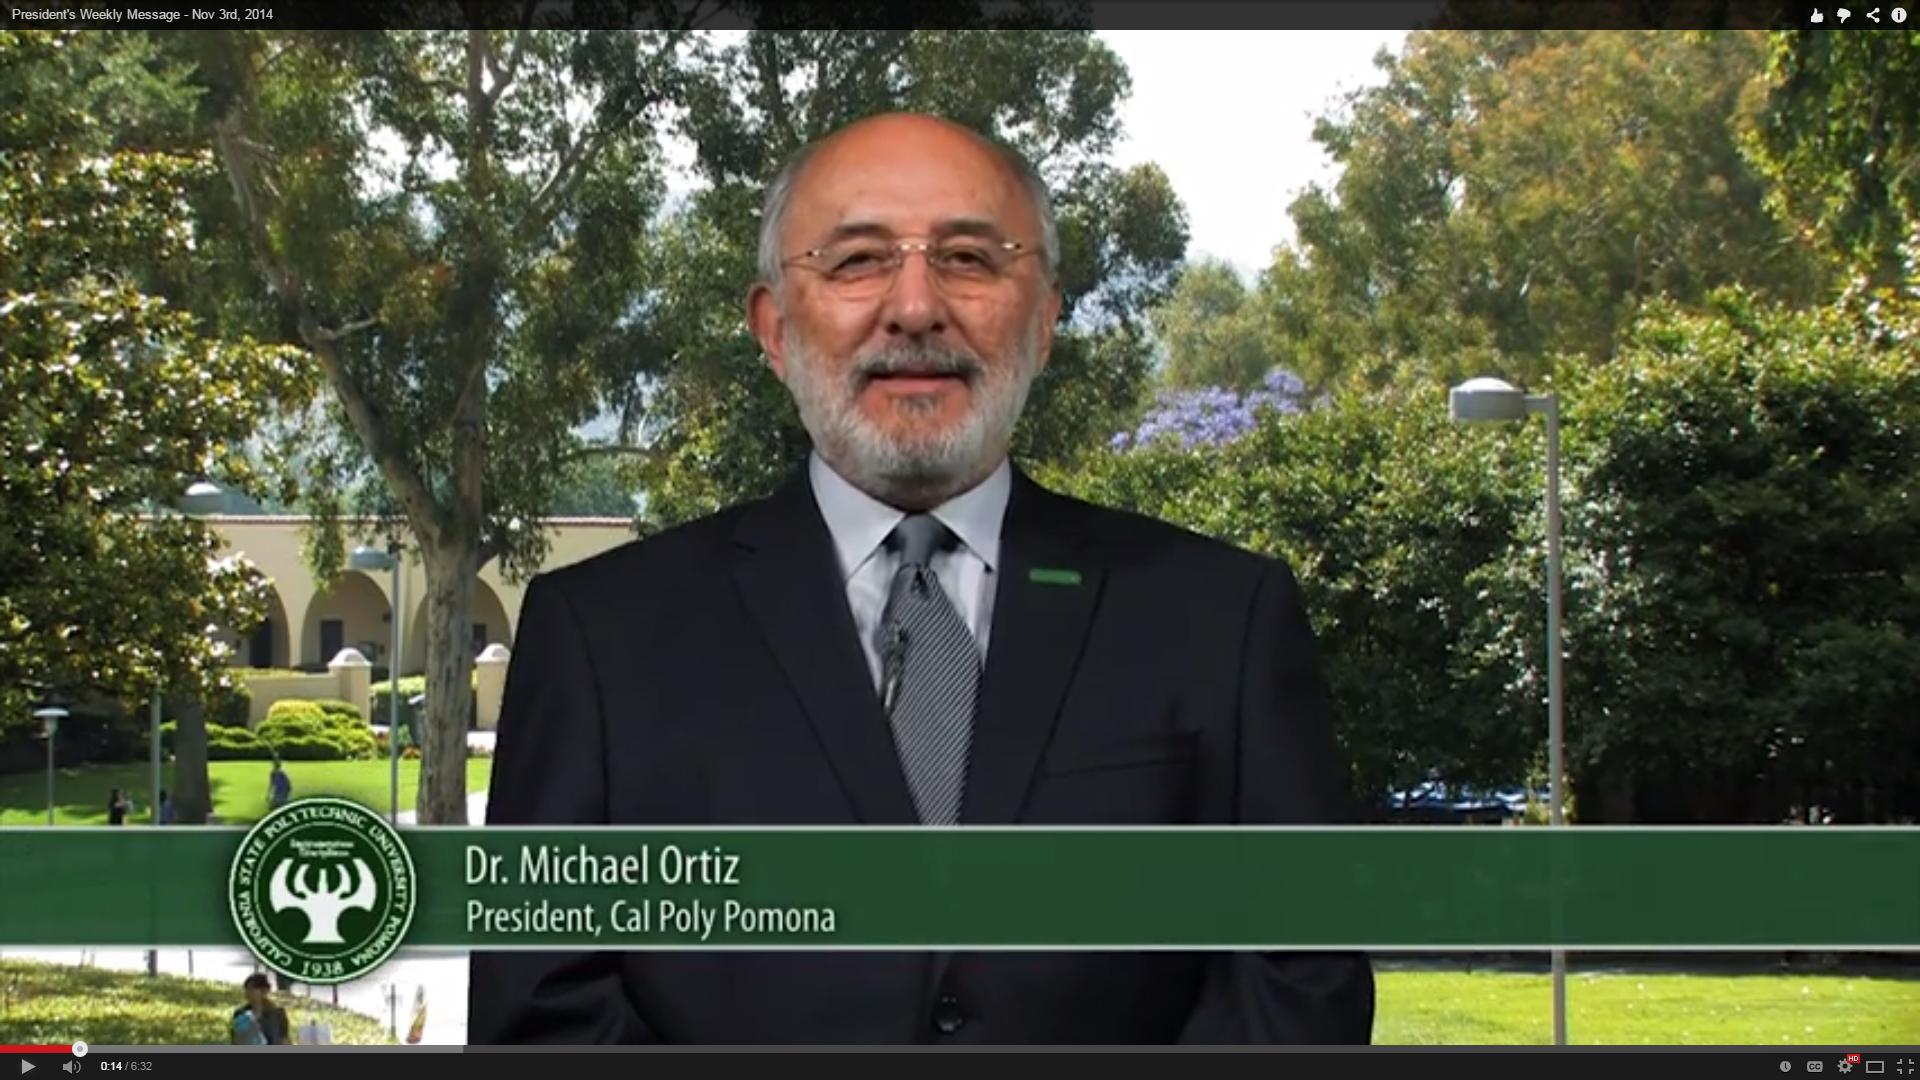 President Ortiz delivers his video update for Nov. 3, 2014.